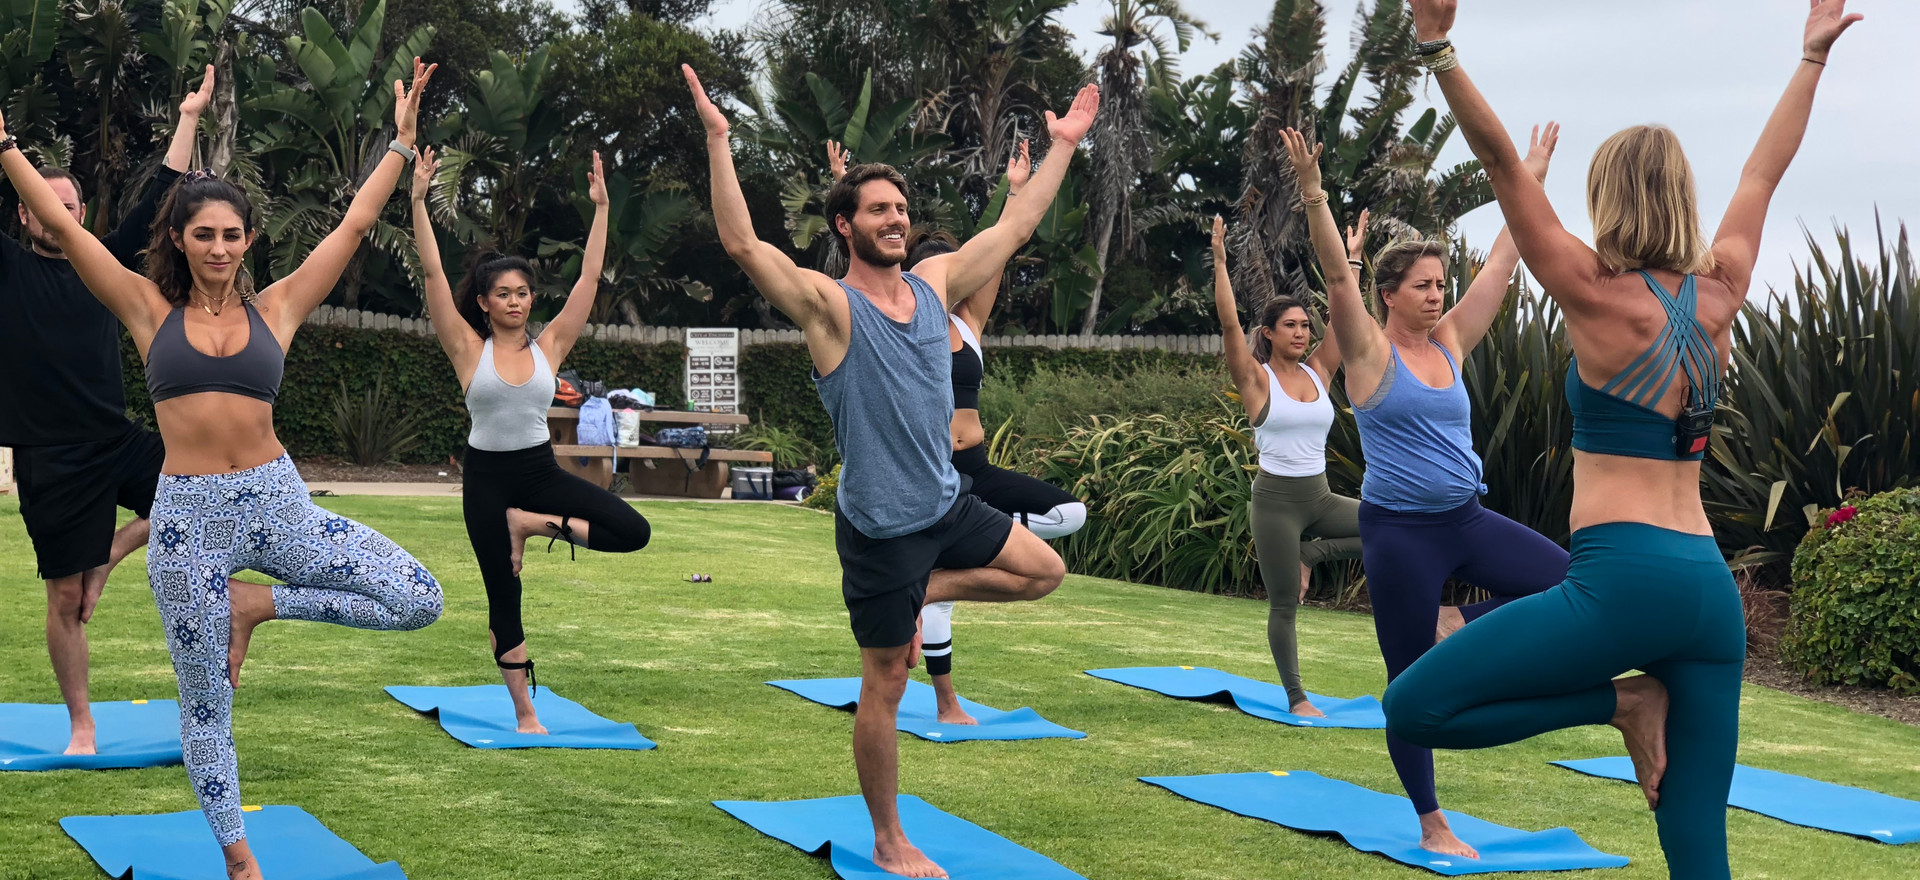 Outdoor Yoga Class.JPG